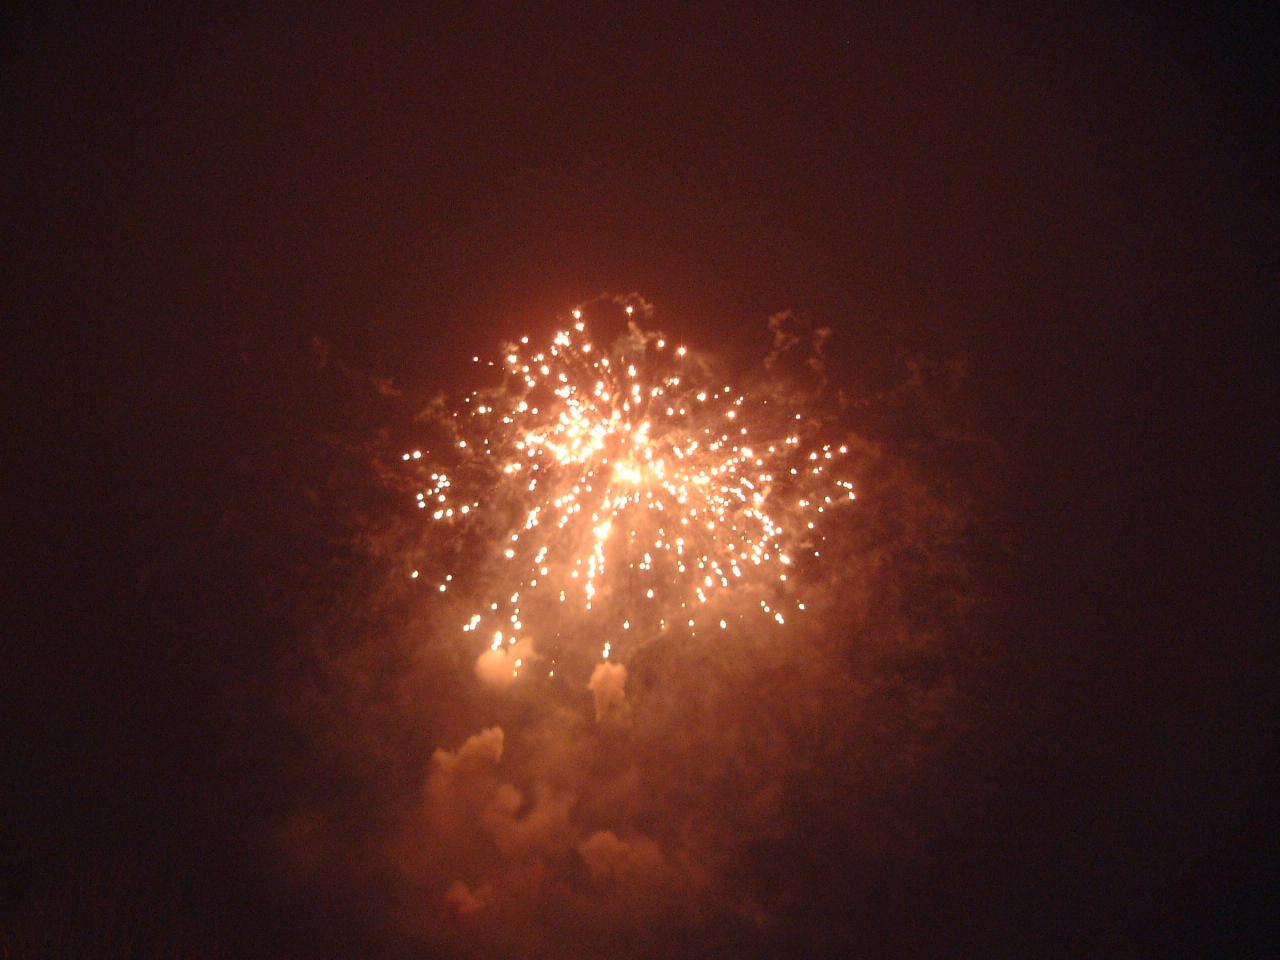 maartent fireworks lights explosion dark bright trails cloud